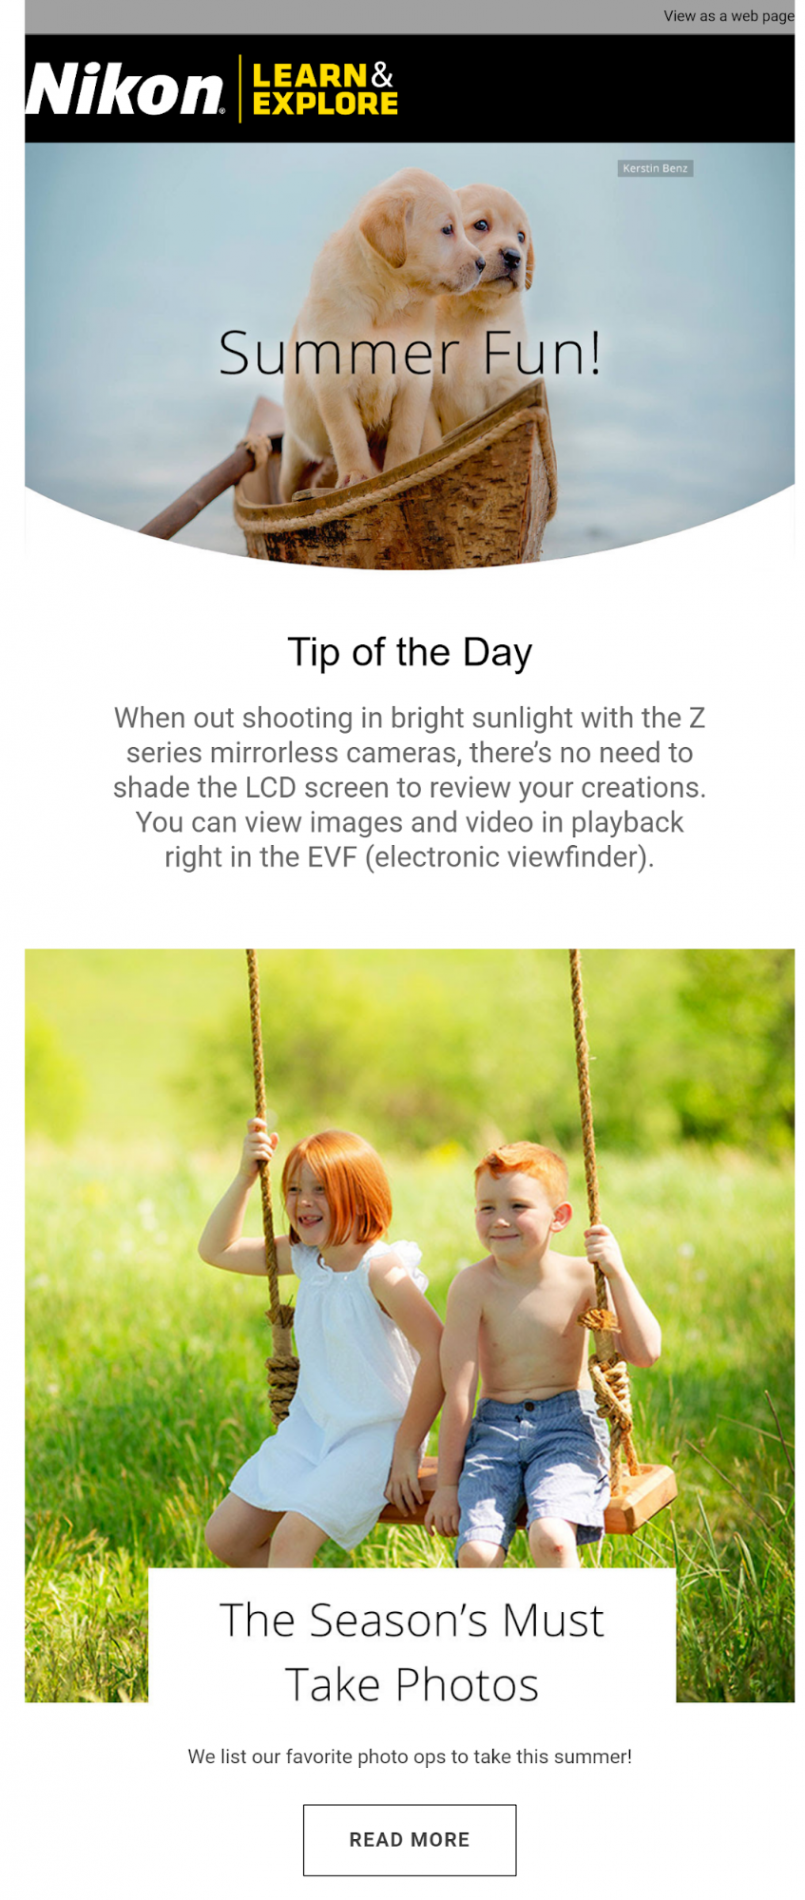 Nikon educational email marketing